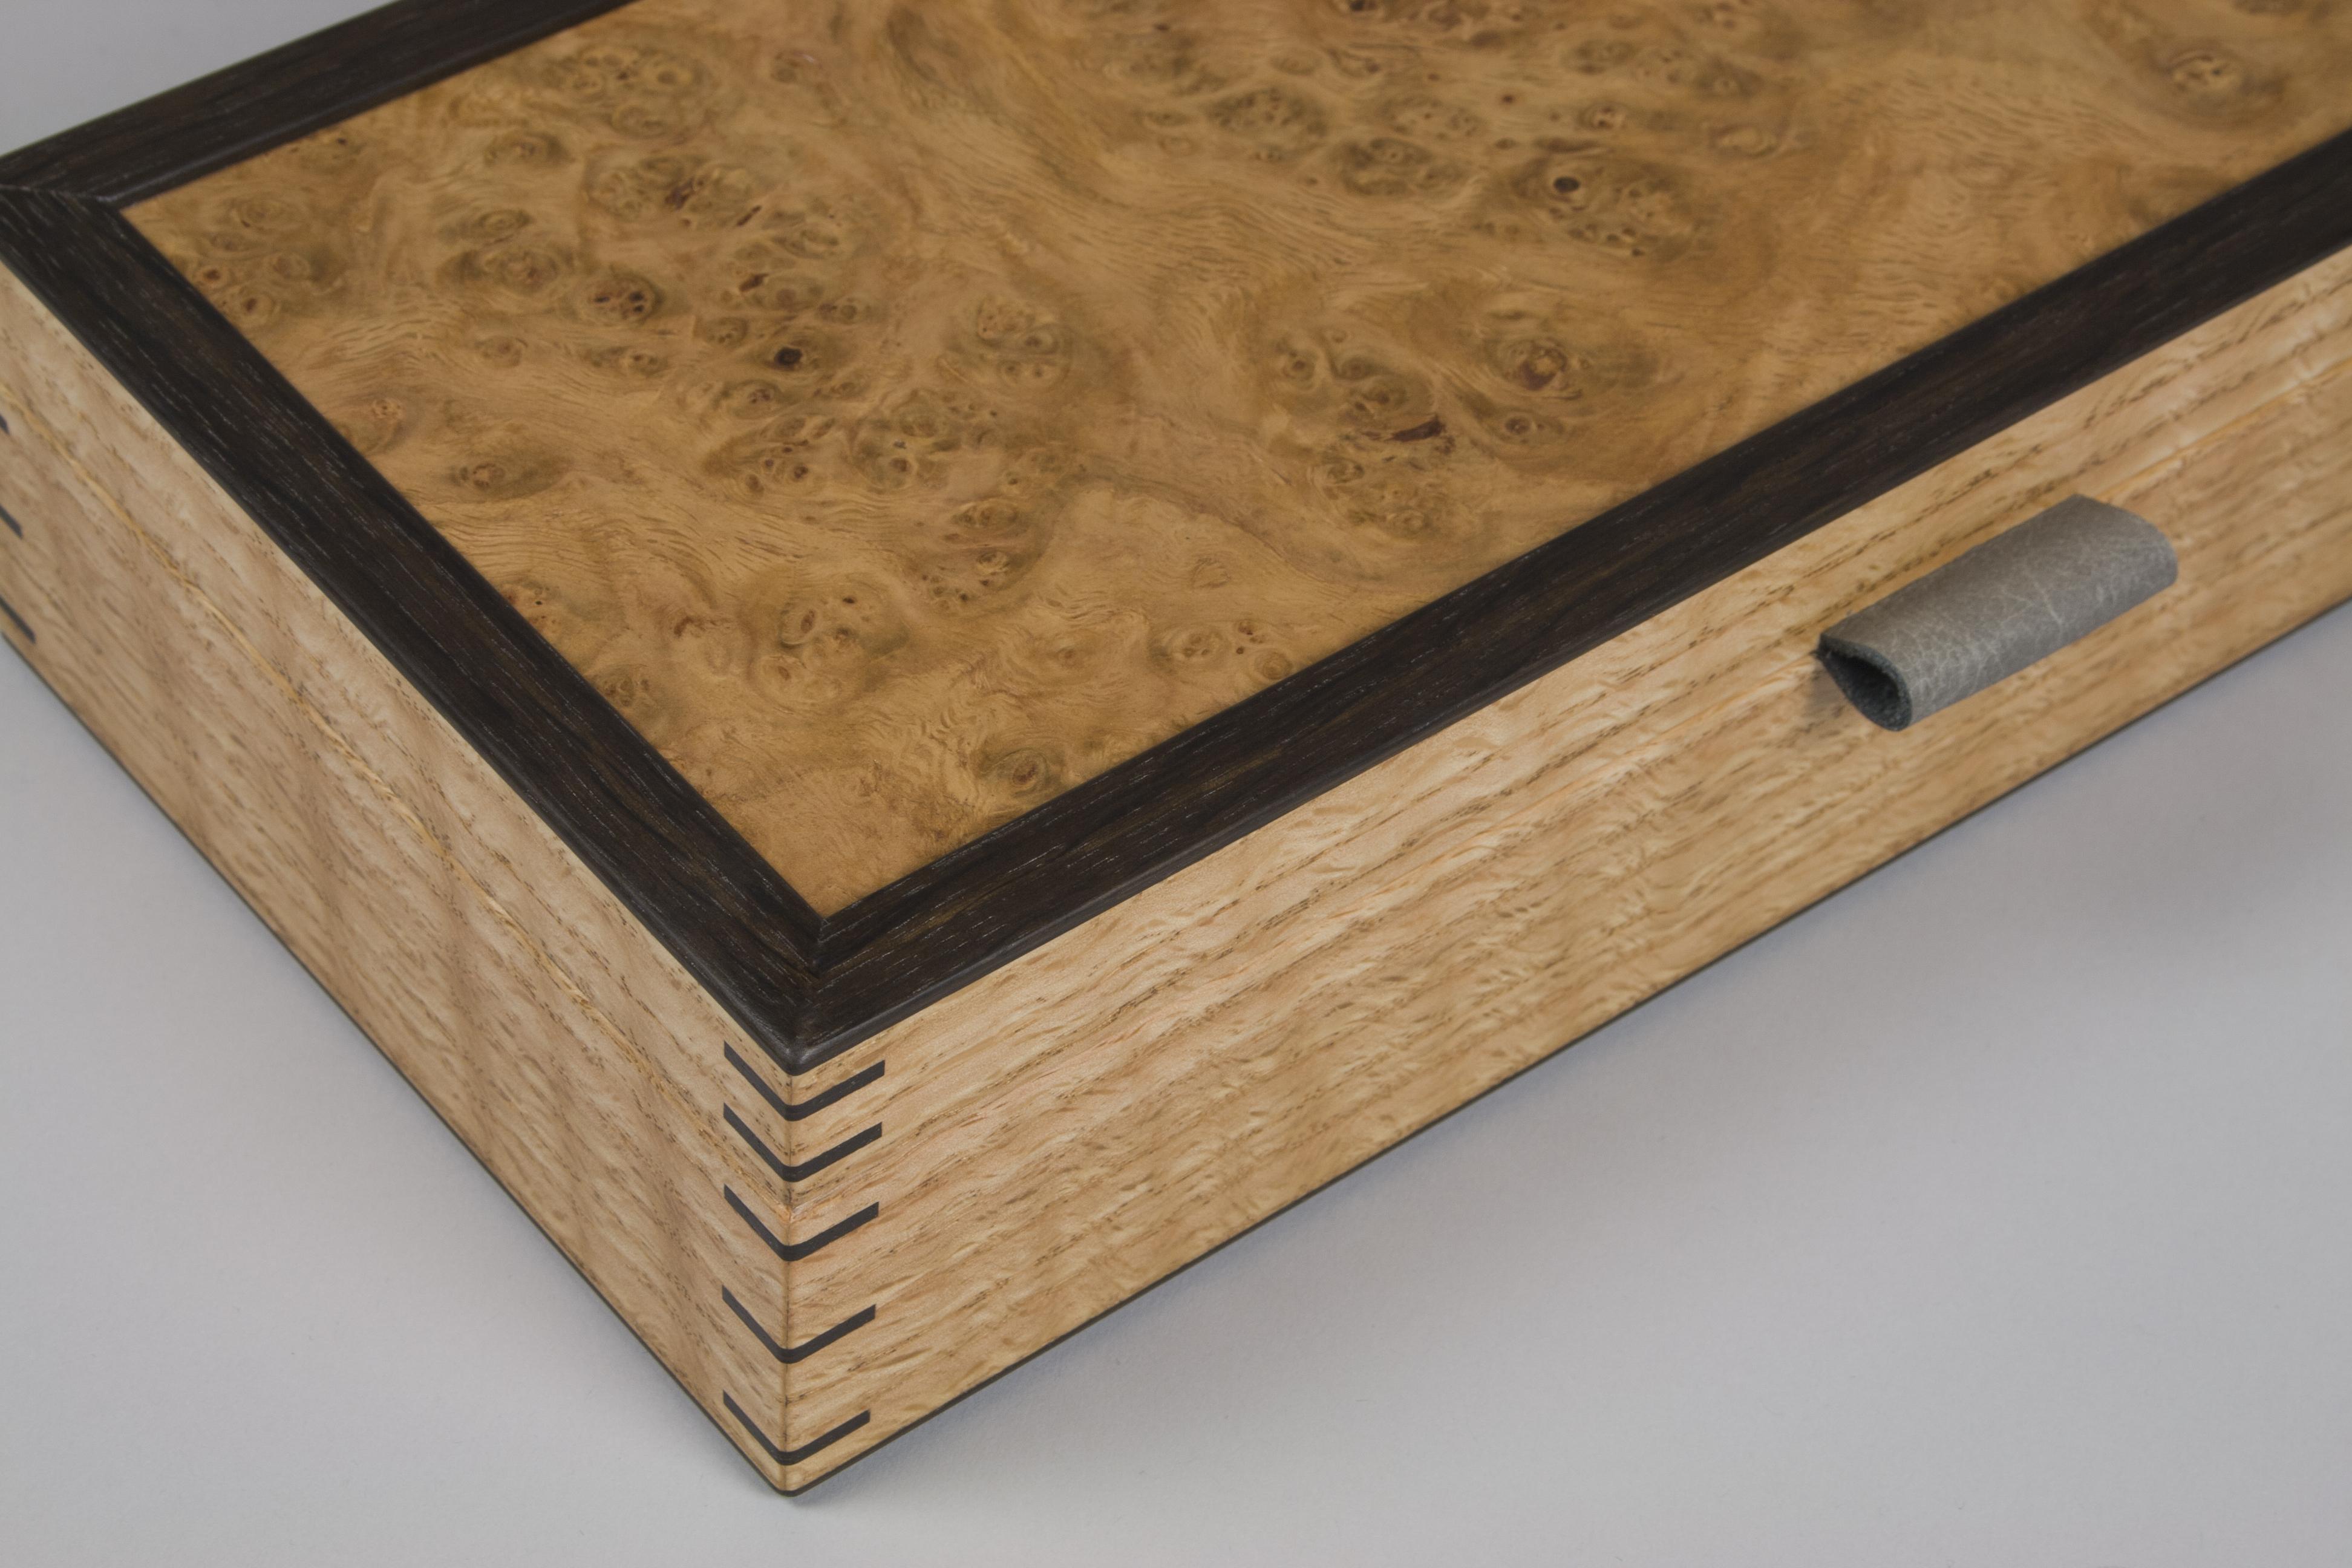 Cufflink box from oak burr